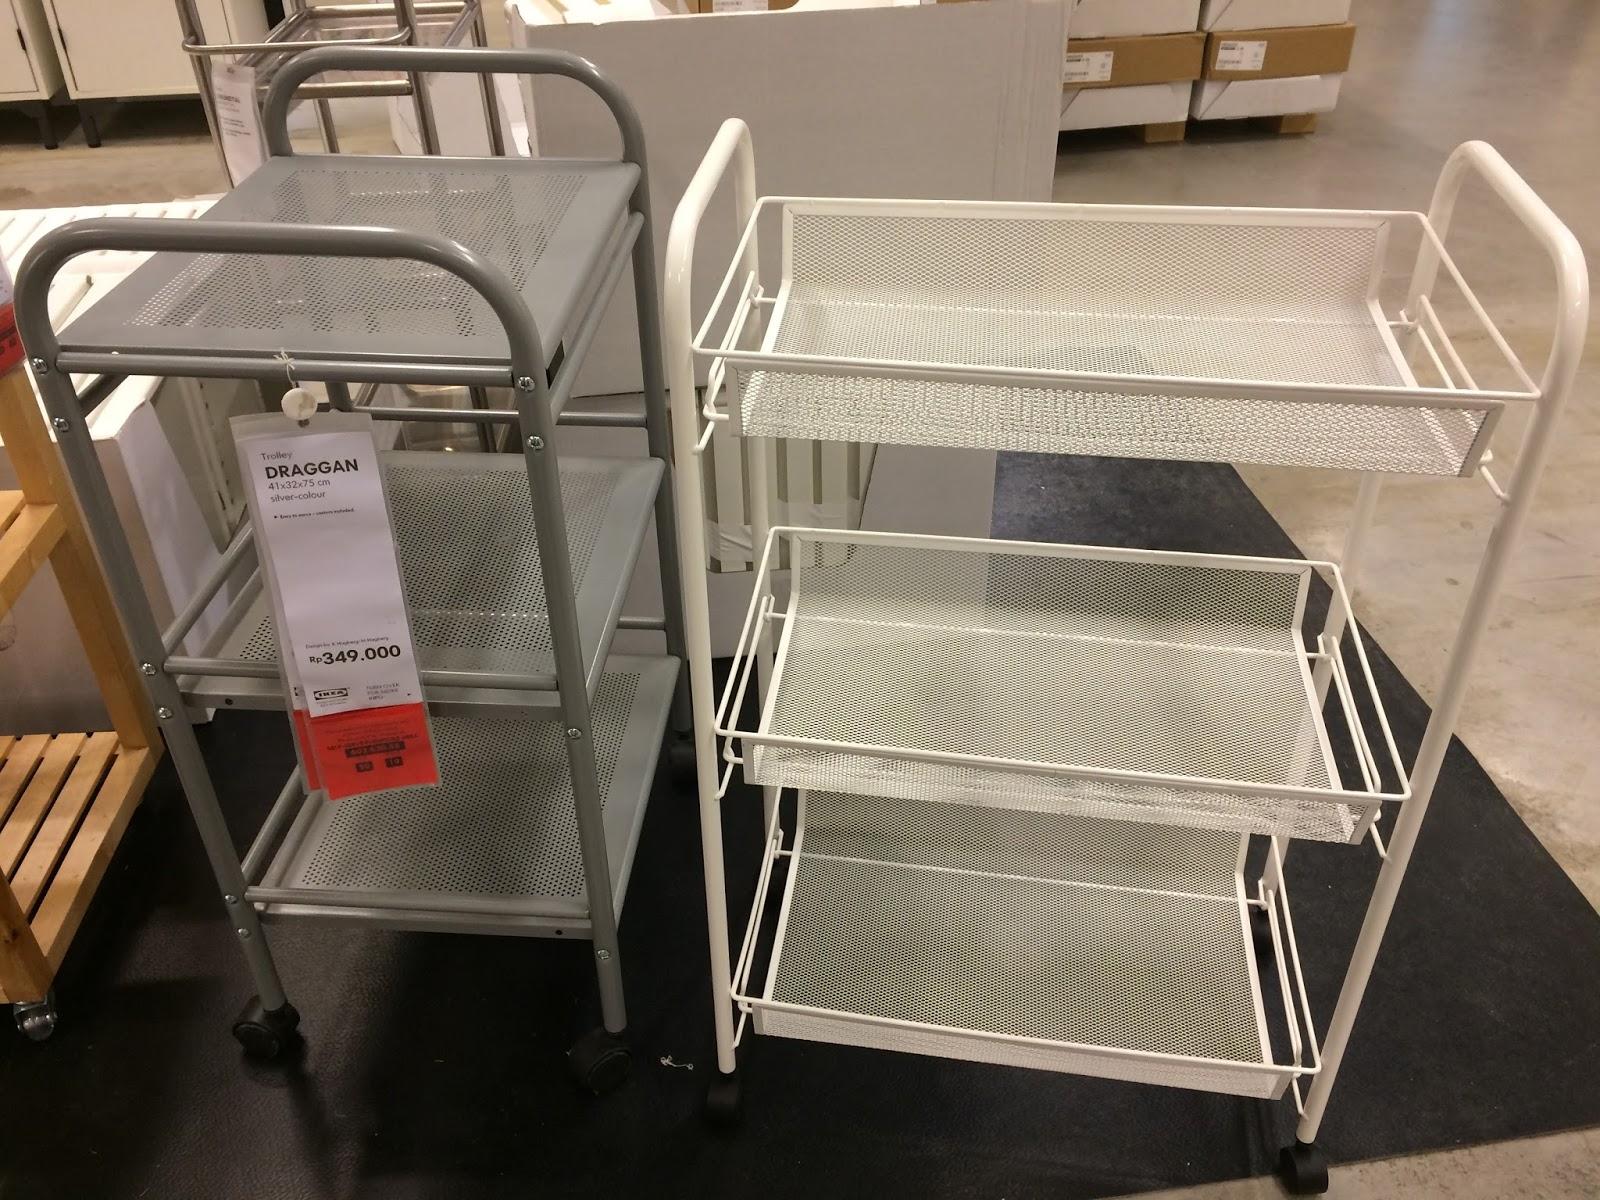 Ikea Len Katalog one zhan